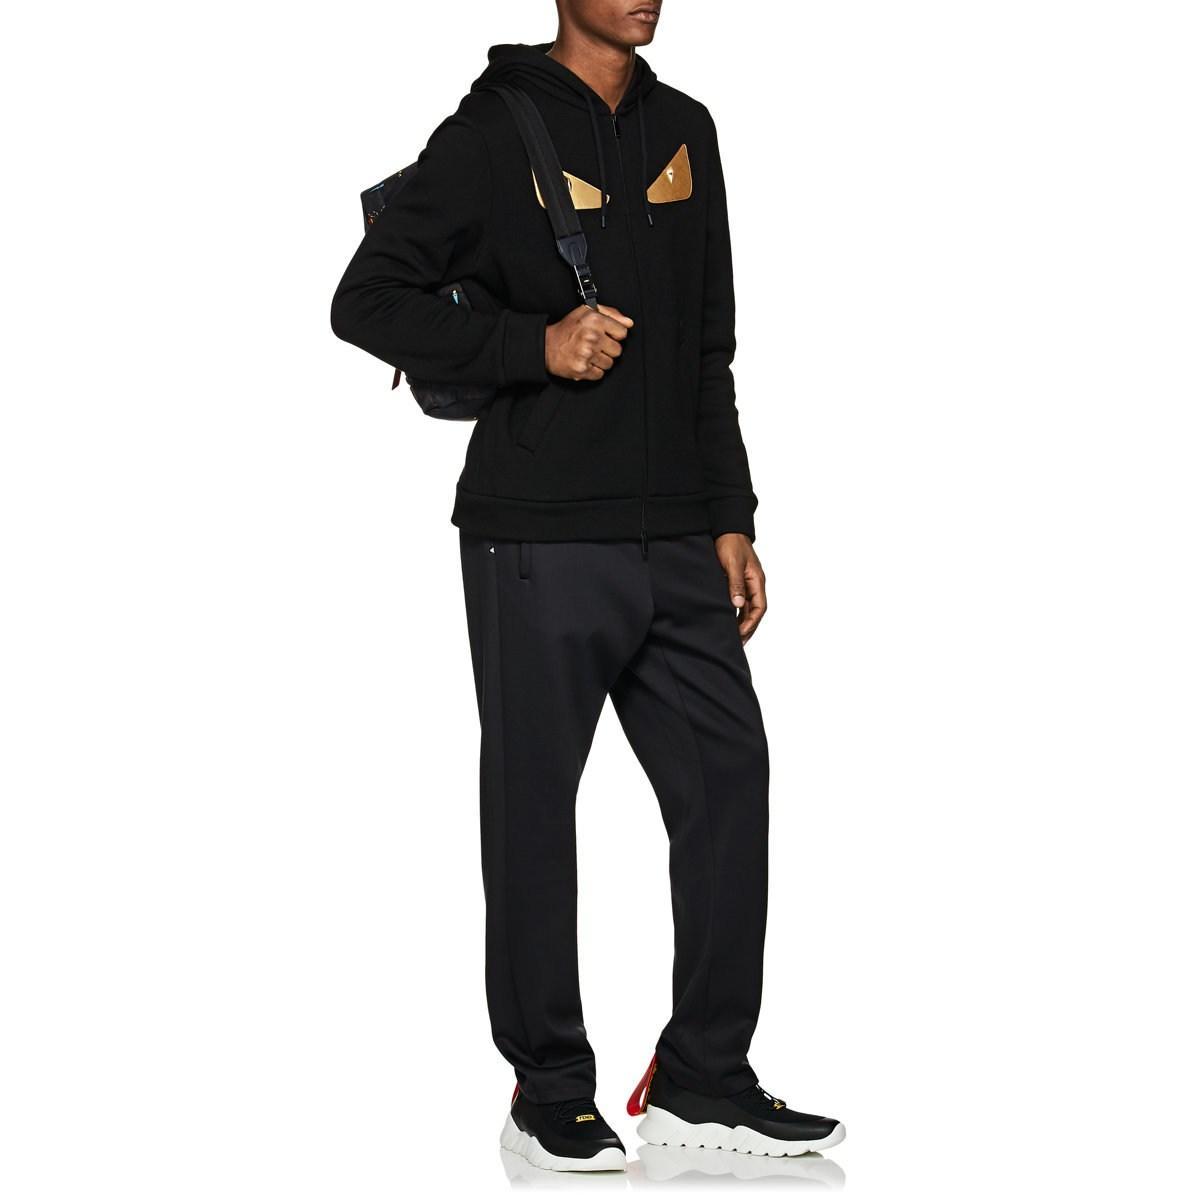 f51d1c56e2f5 Fendi - Black Bag Bugs Zipped Sweatshirt for Men - Lyst. View fullscreen